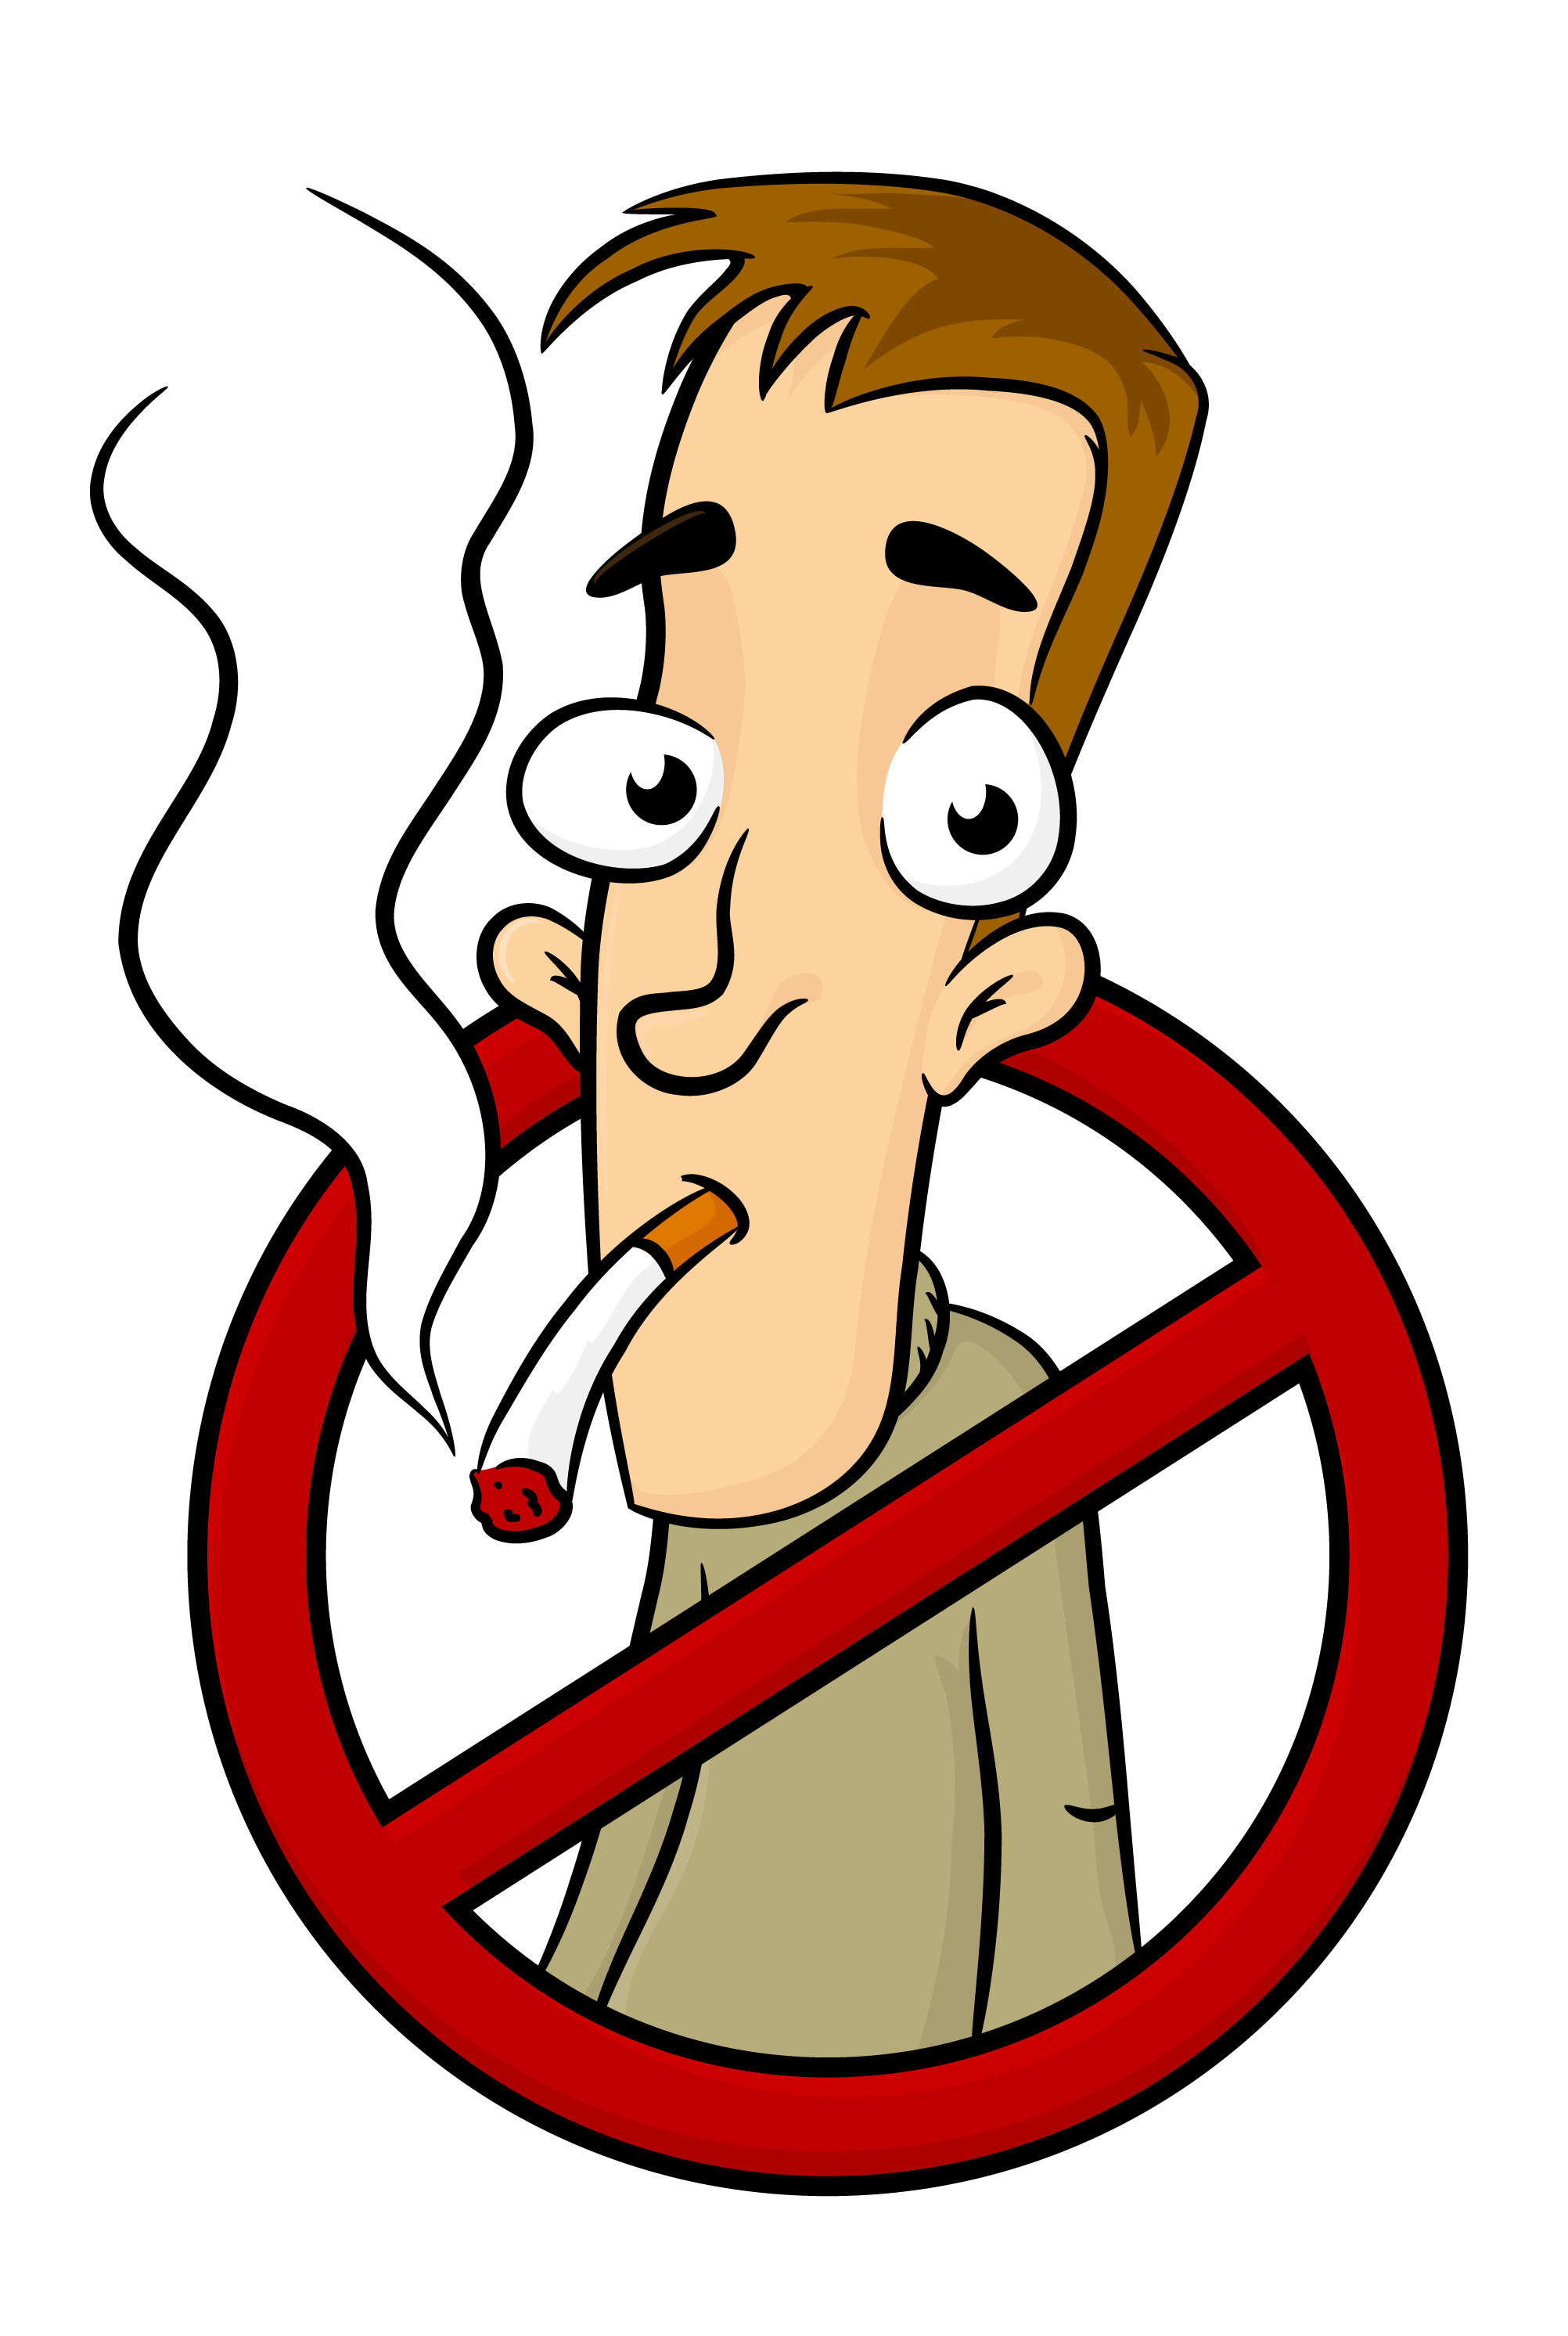 2004x2985 Boy Clipart Smoking